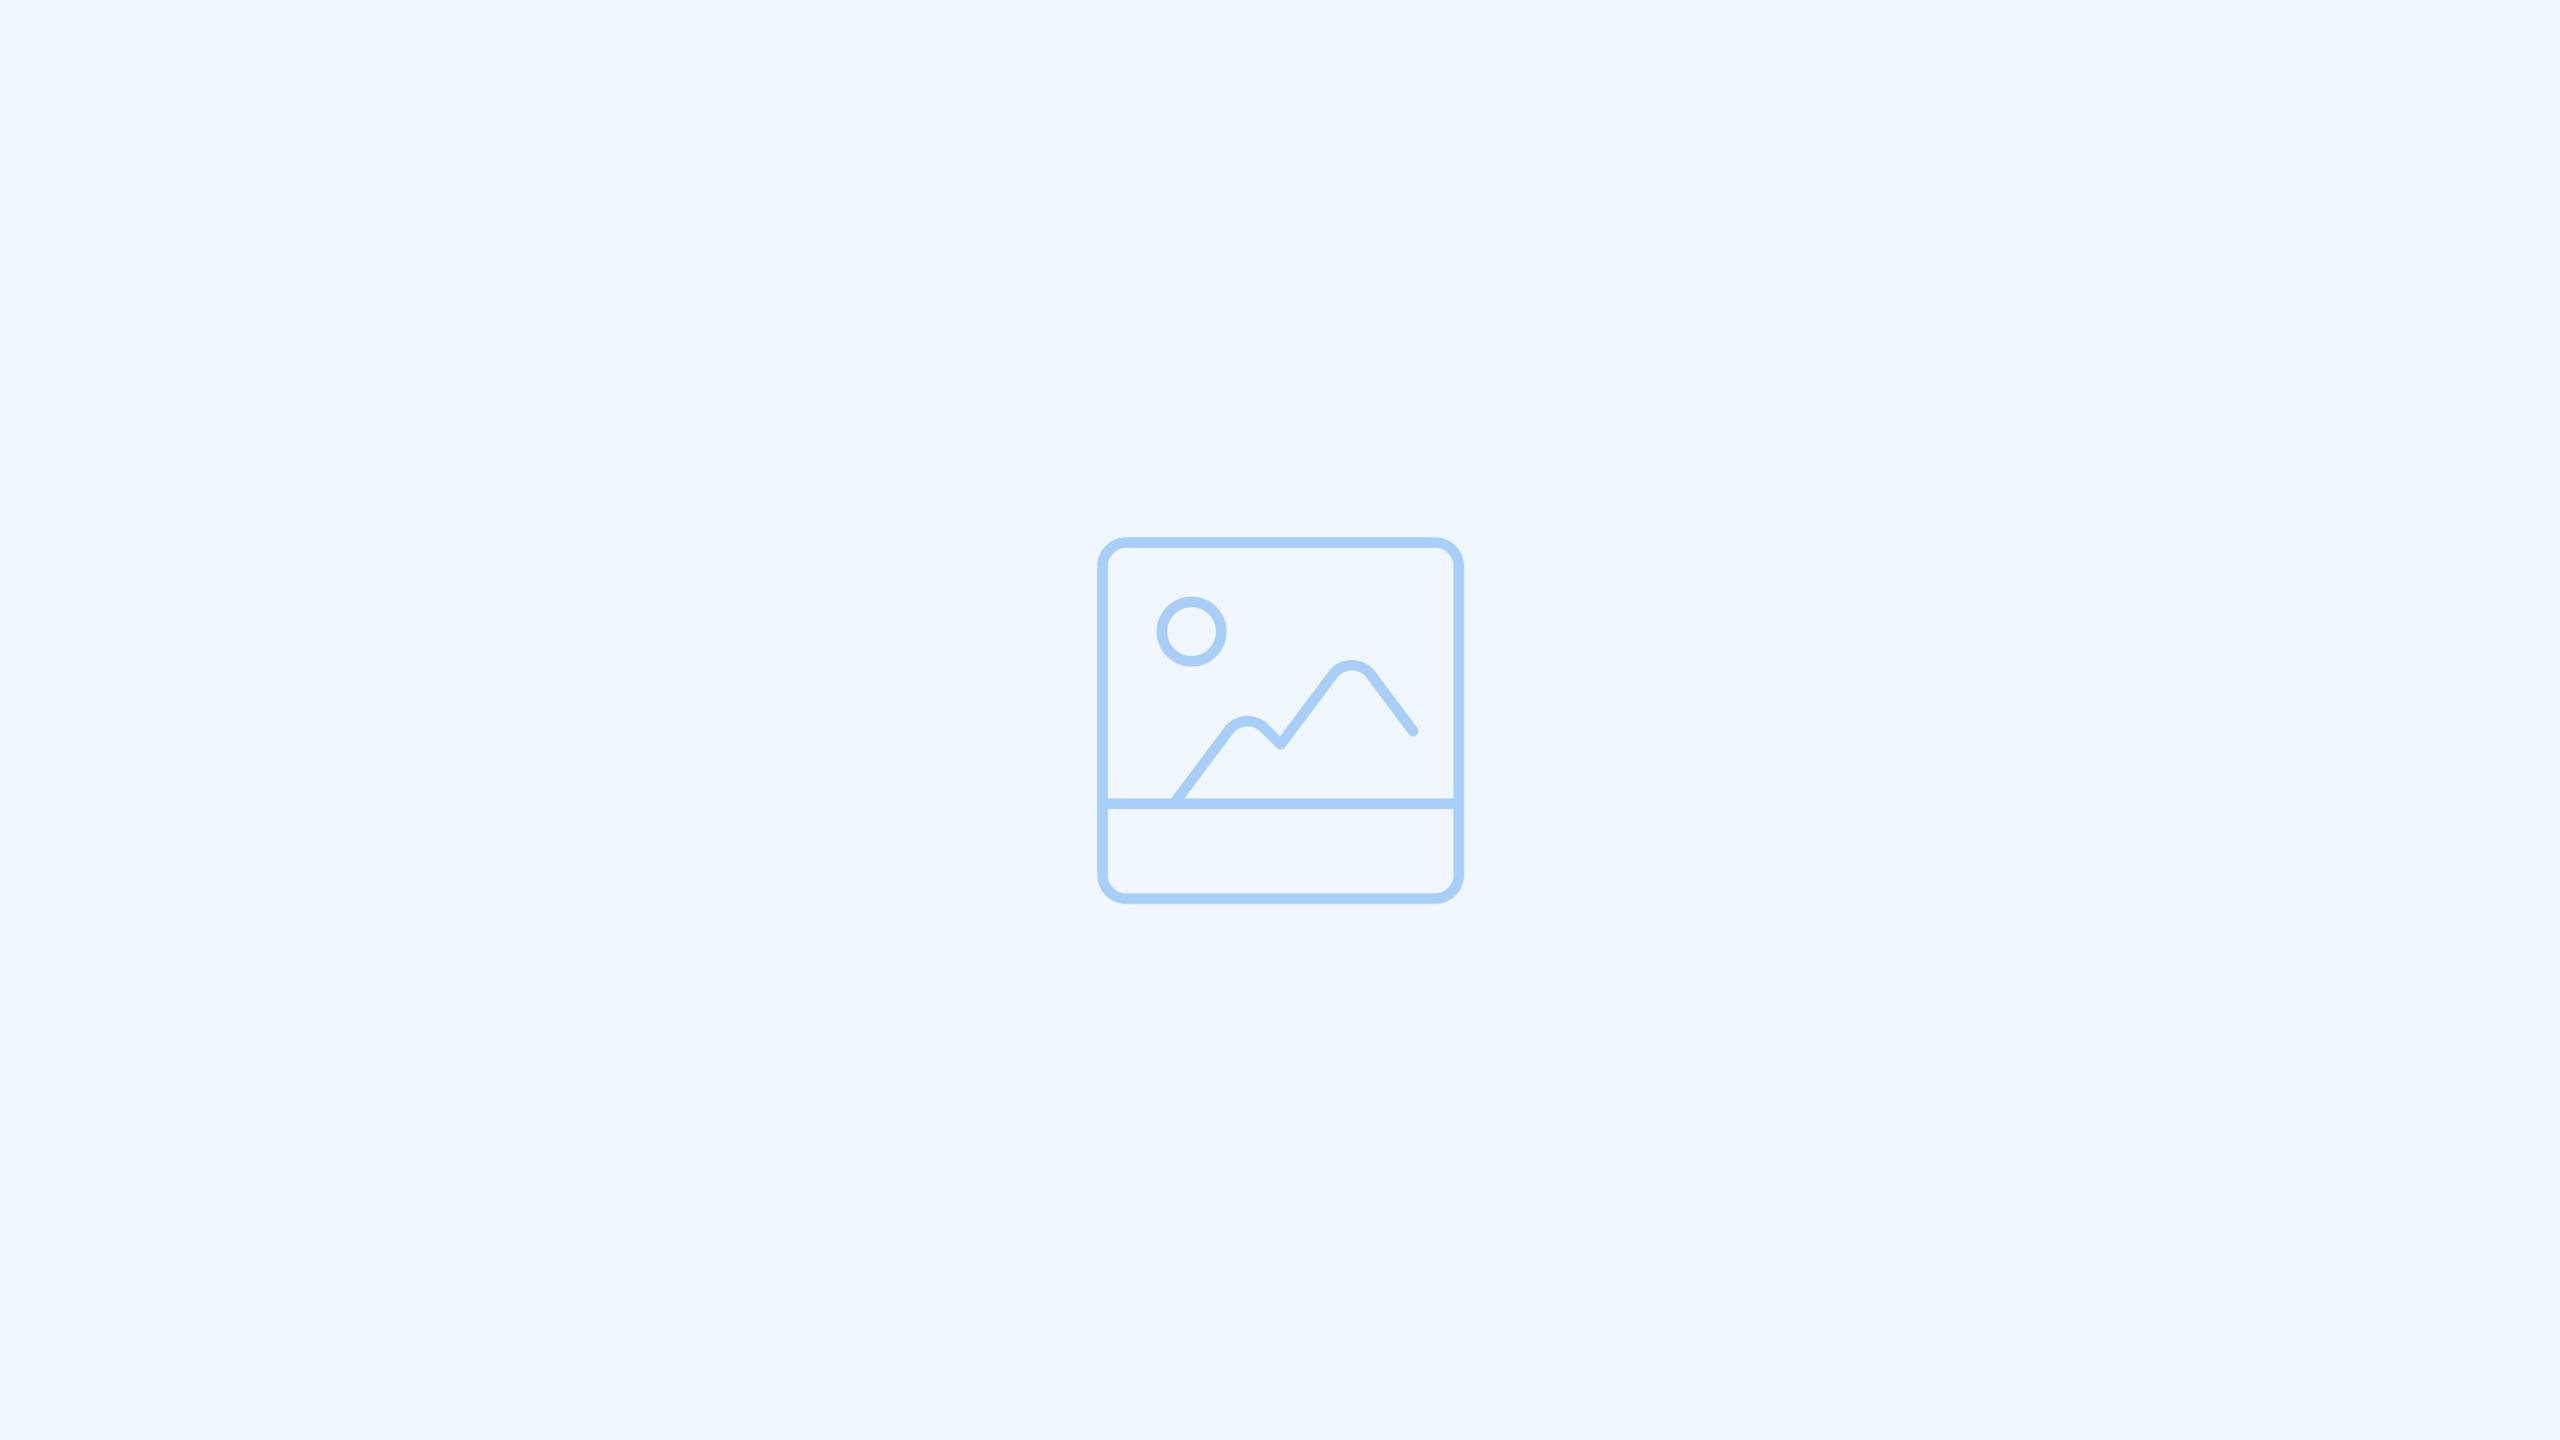 two-step optin image